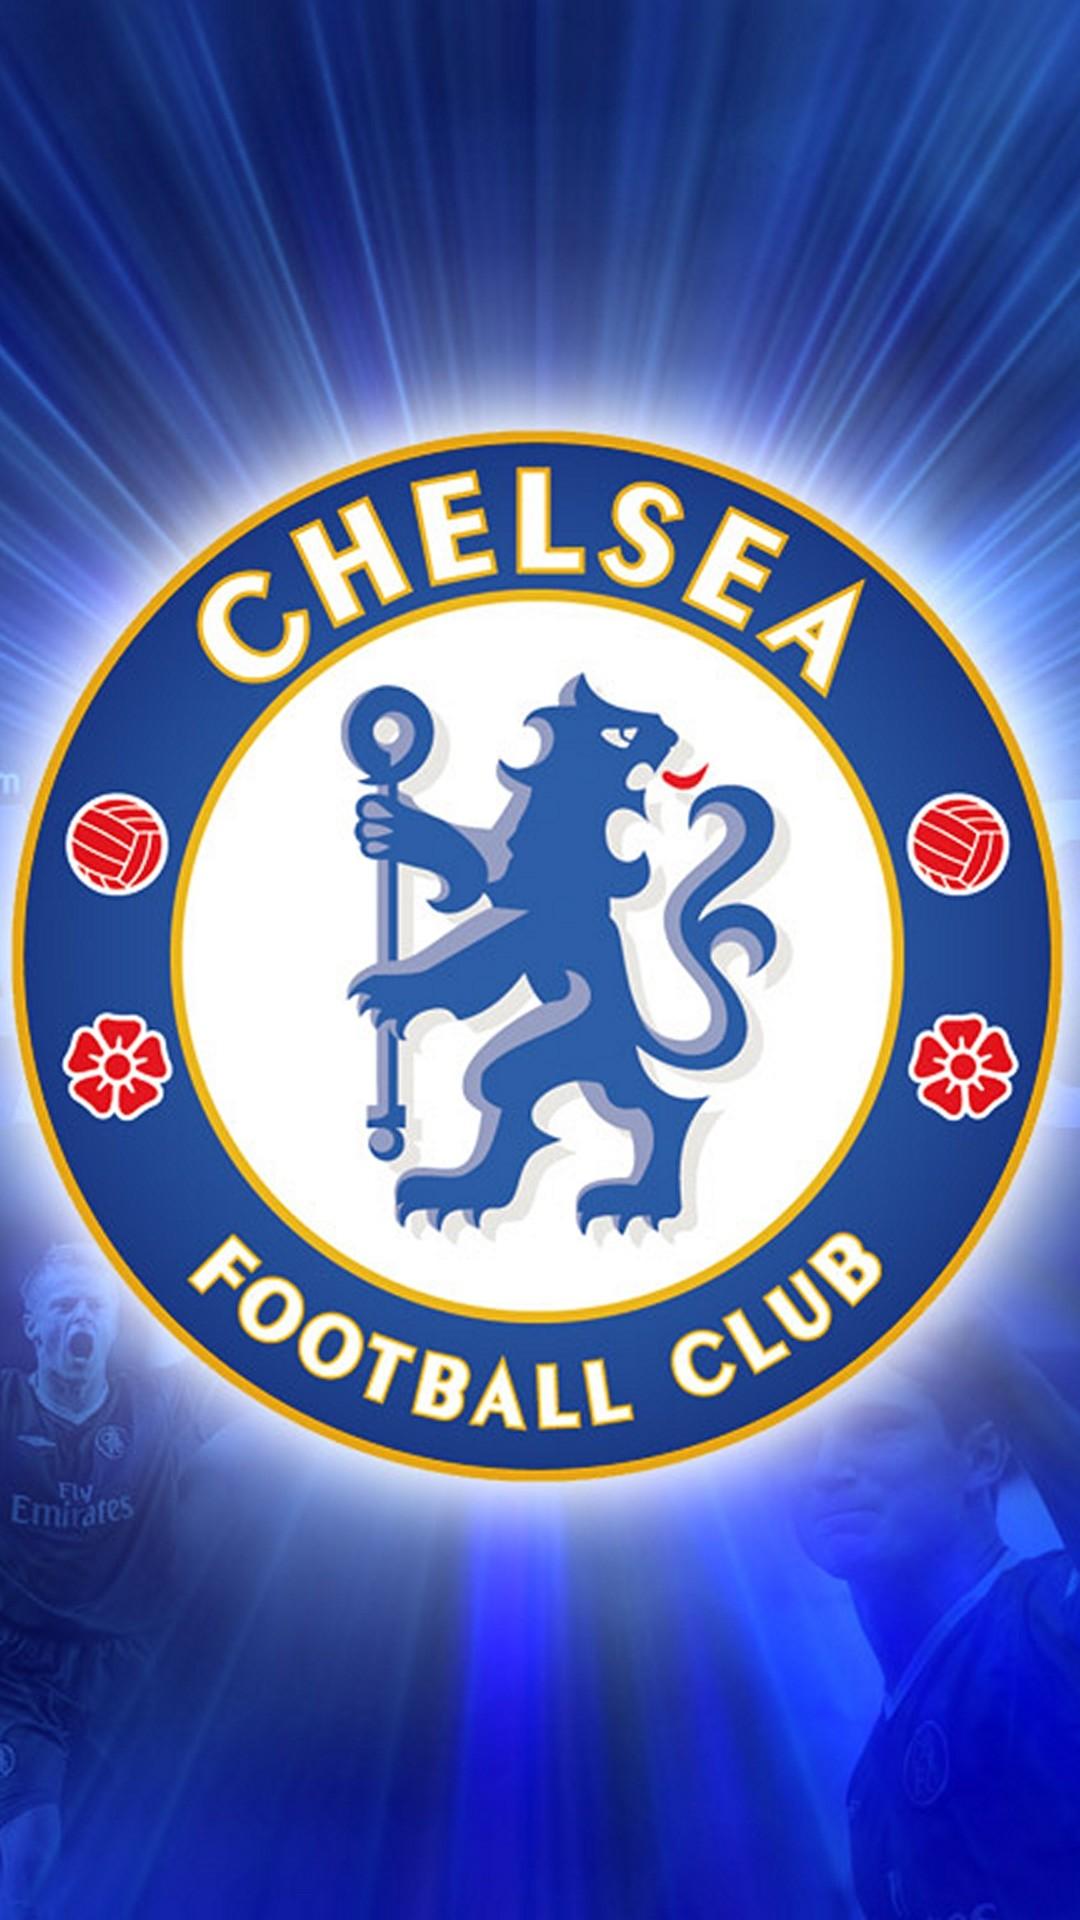 Wallpaper iphone football – Chelsea Fc Logo Football Iphone 6 Plus Hd  Wallpaper